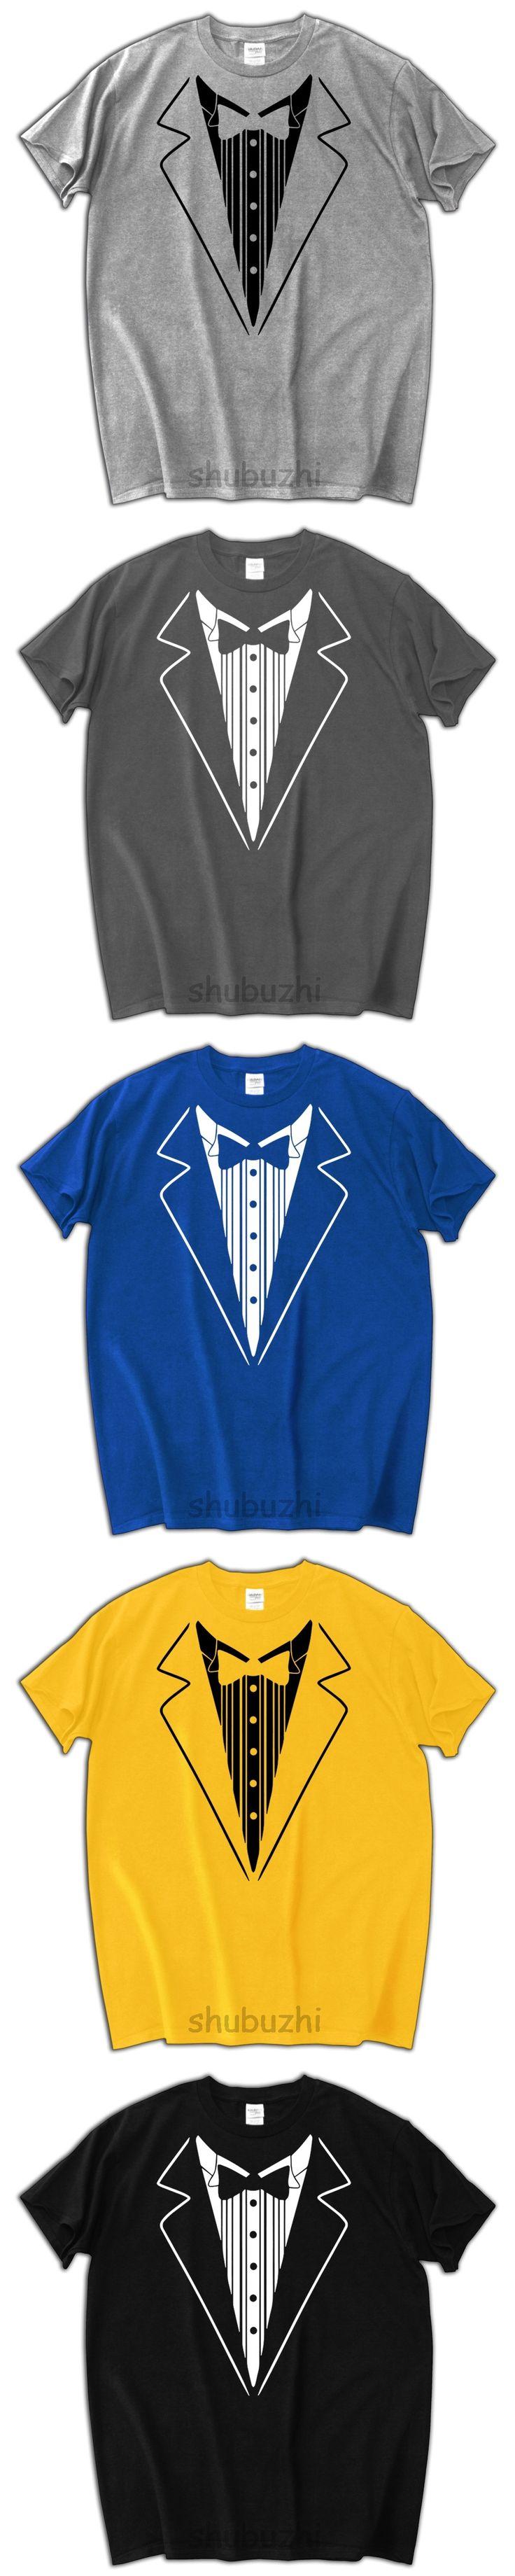 SMOKING TUXEDO SHIRT 2017 new men hip-hop cool tshirt fashion cotton tee shirt homme casual pattern man shirt for summer